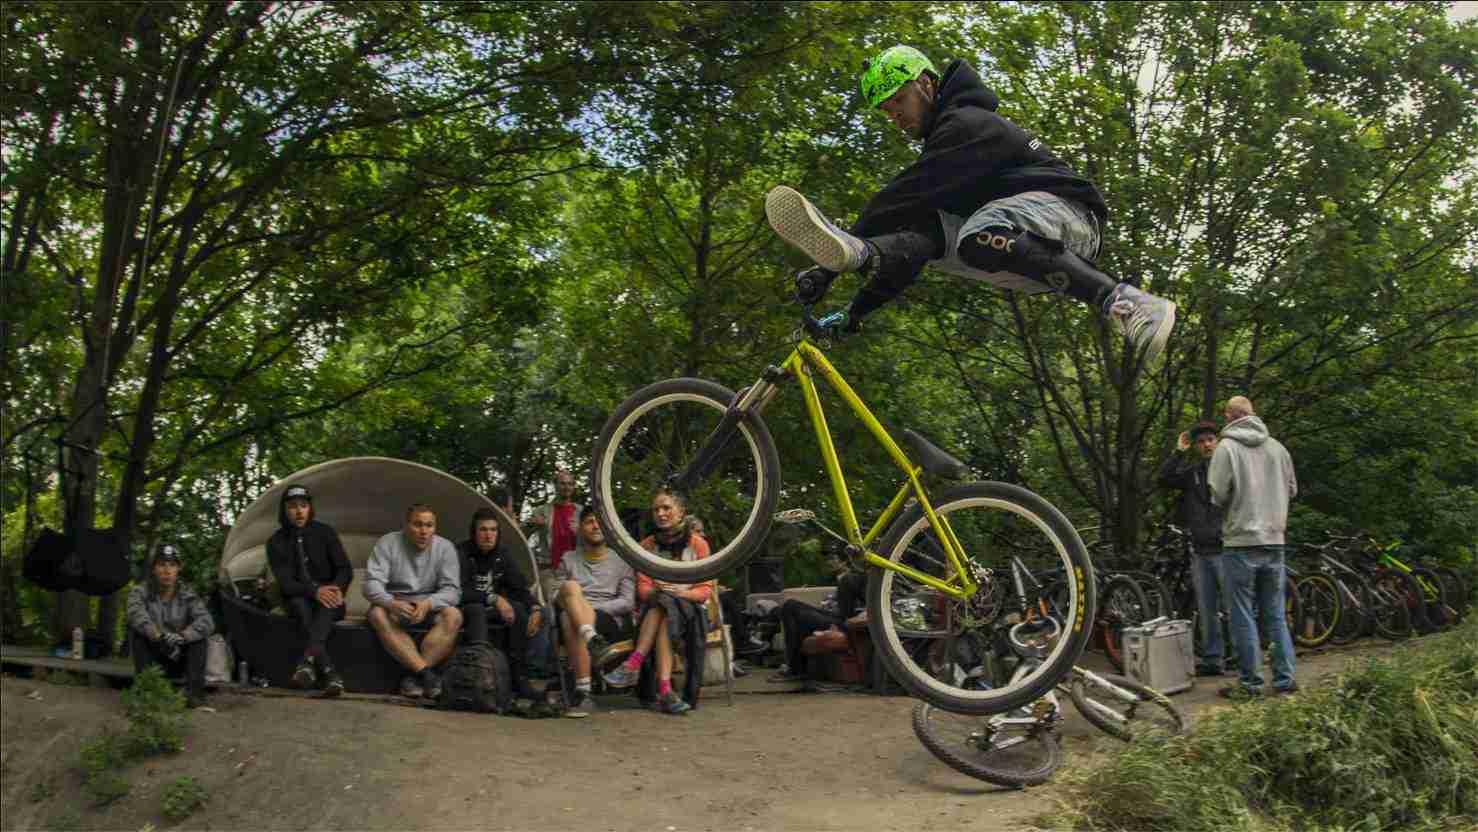 holmen-dirt-aktiviteter-dirtjump-bmx-pumptrack-rekreativ-social-friluftsliv-cykelleg-sikker-cyklist-København-Copenhagen-Christianshavn-cykel-dirt-jump-24